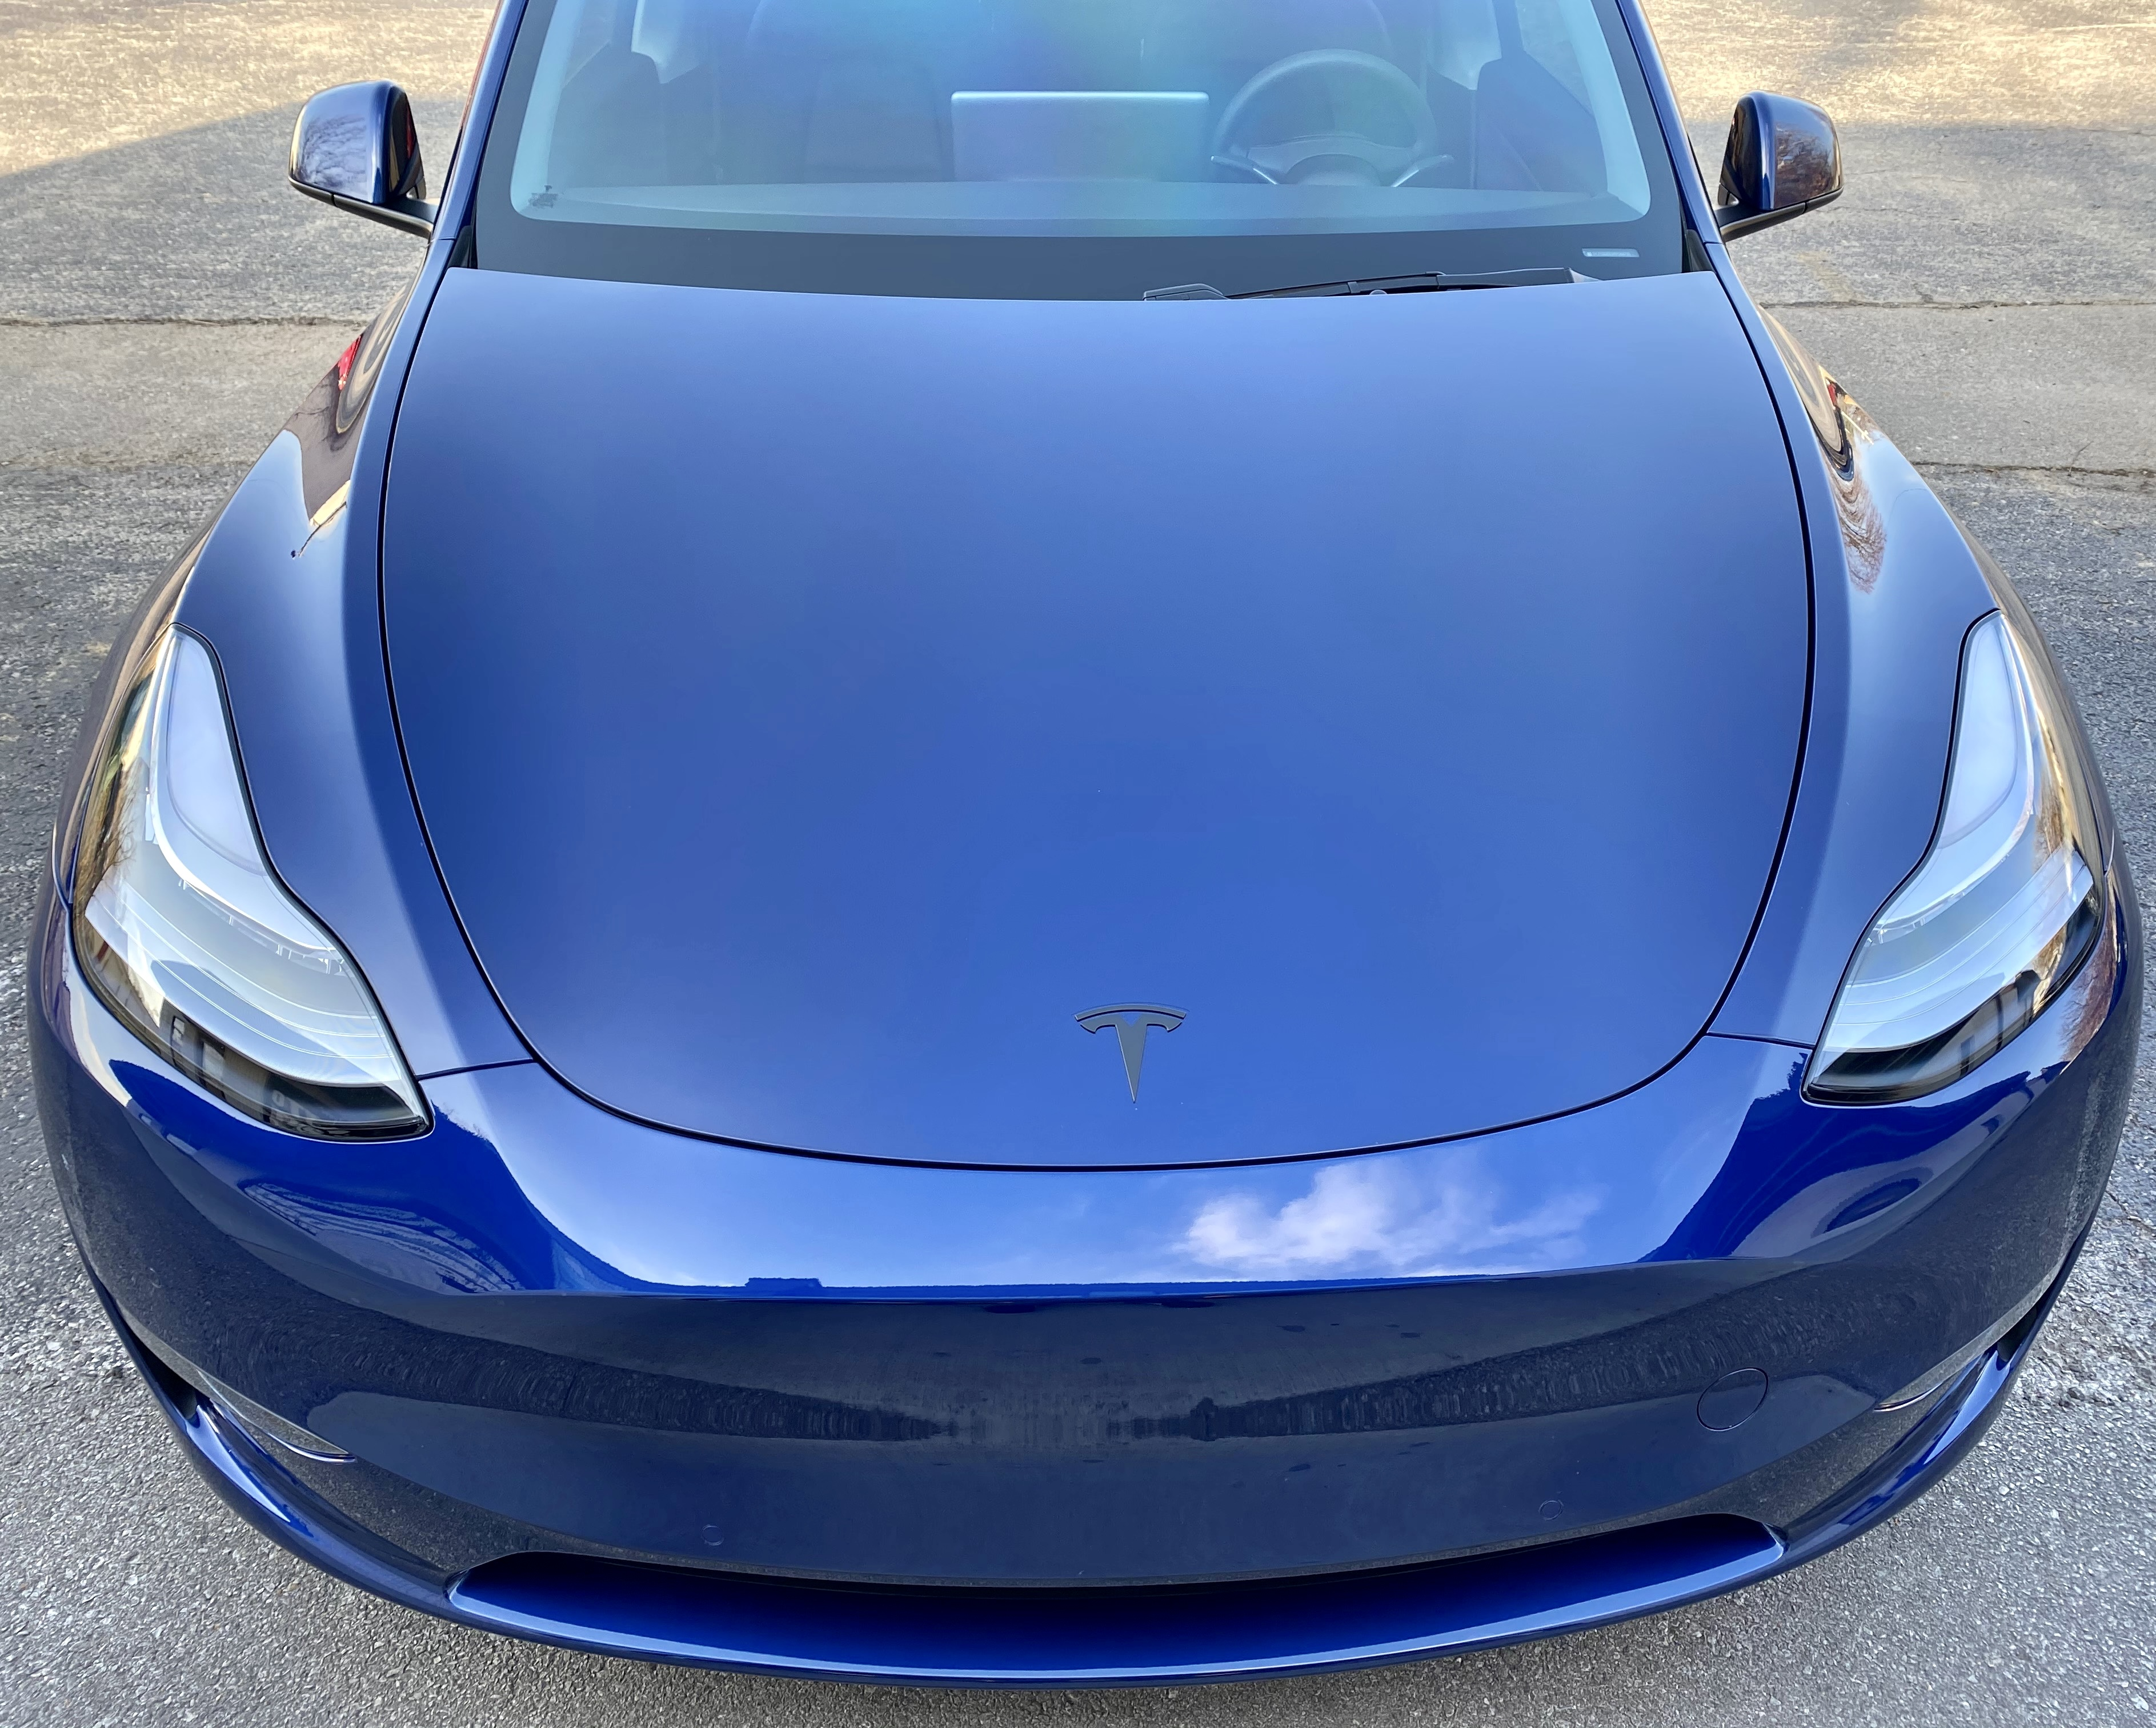 Tesla model y paint protection film Kansas city